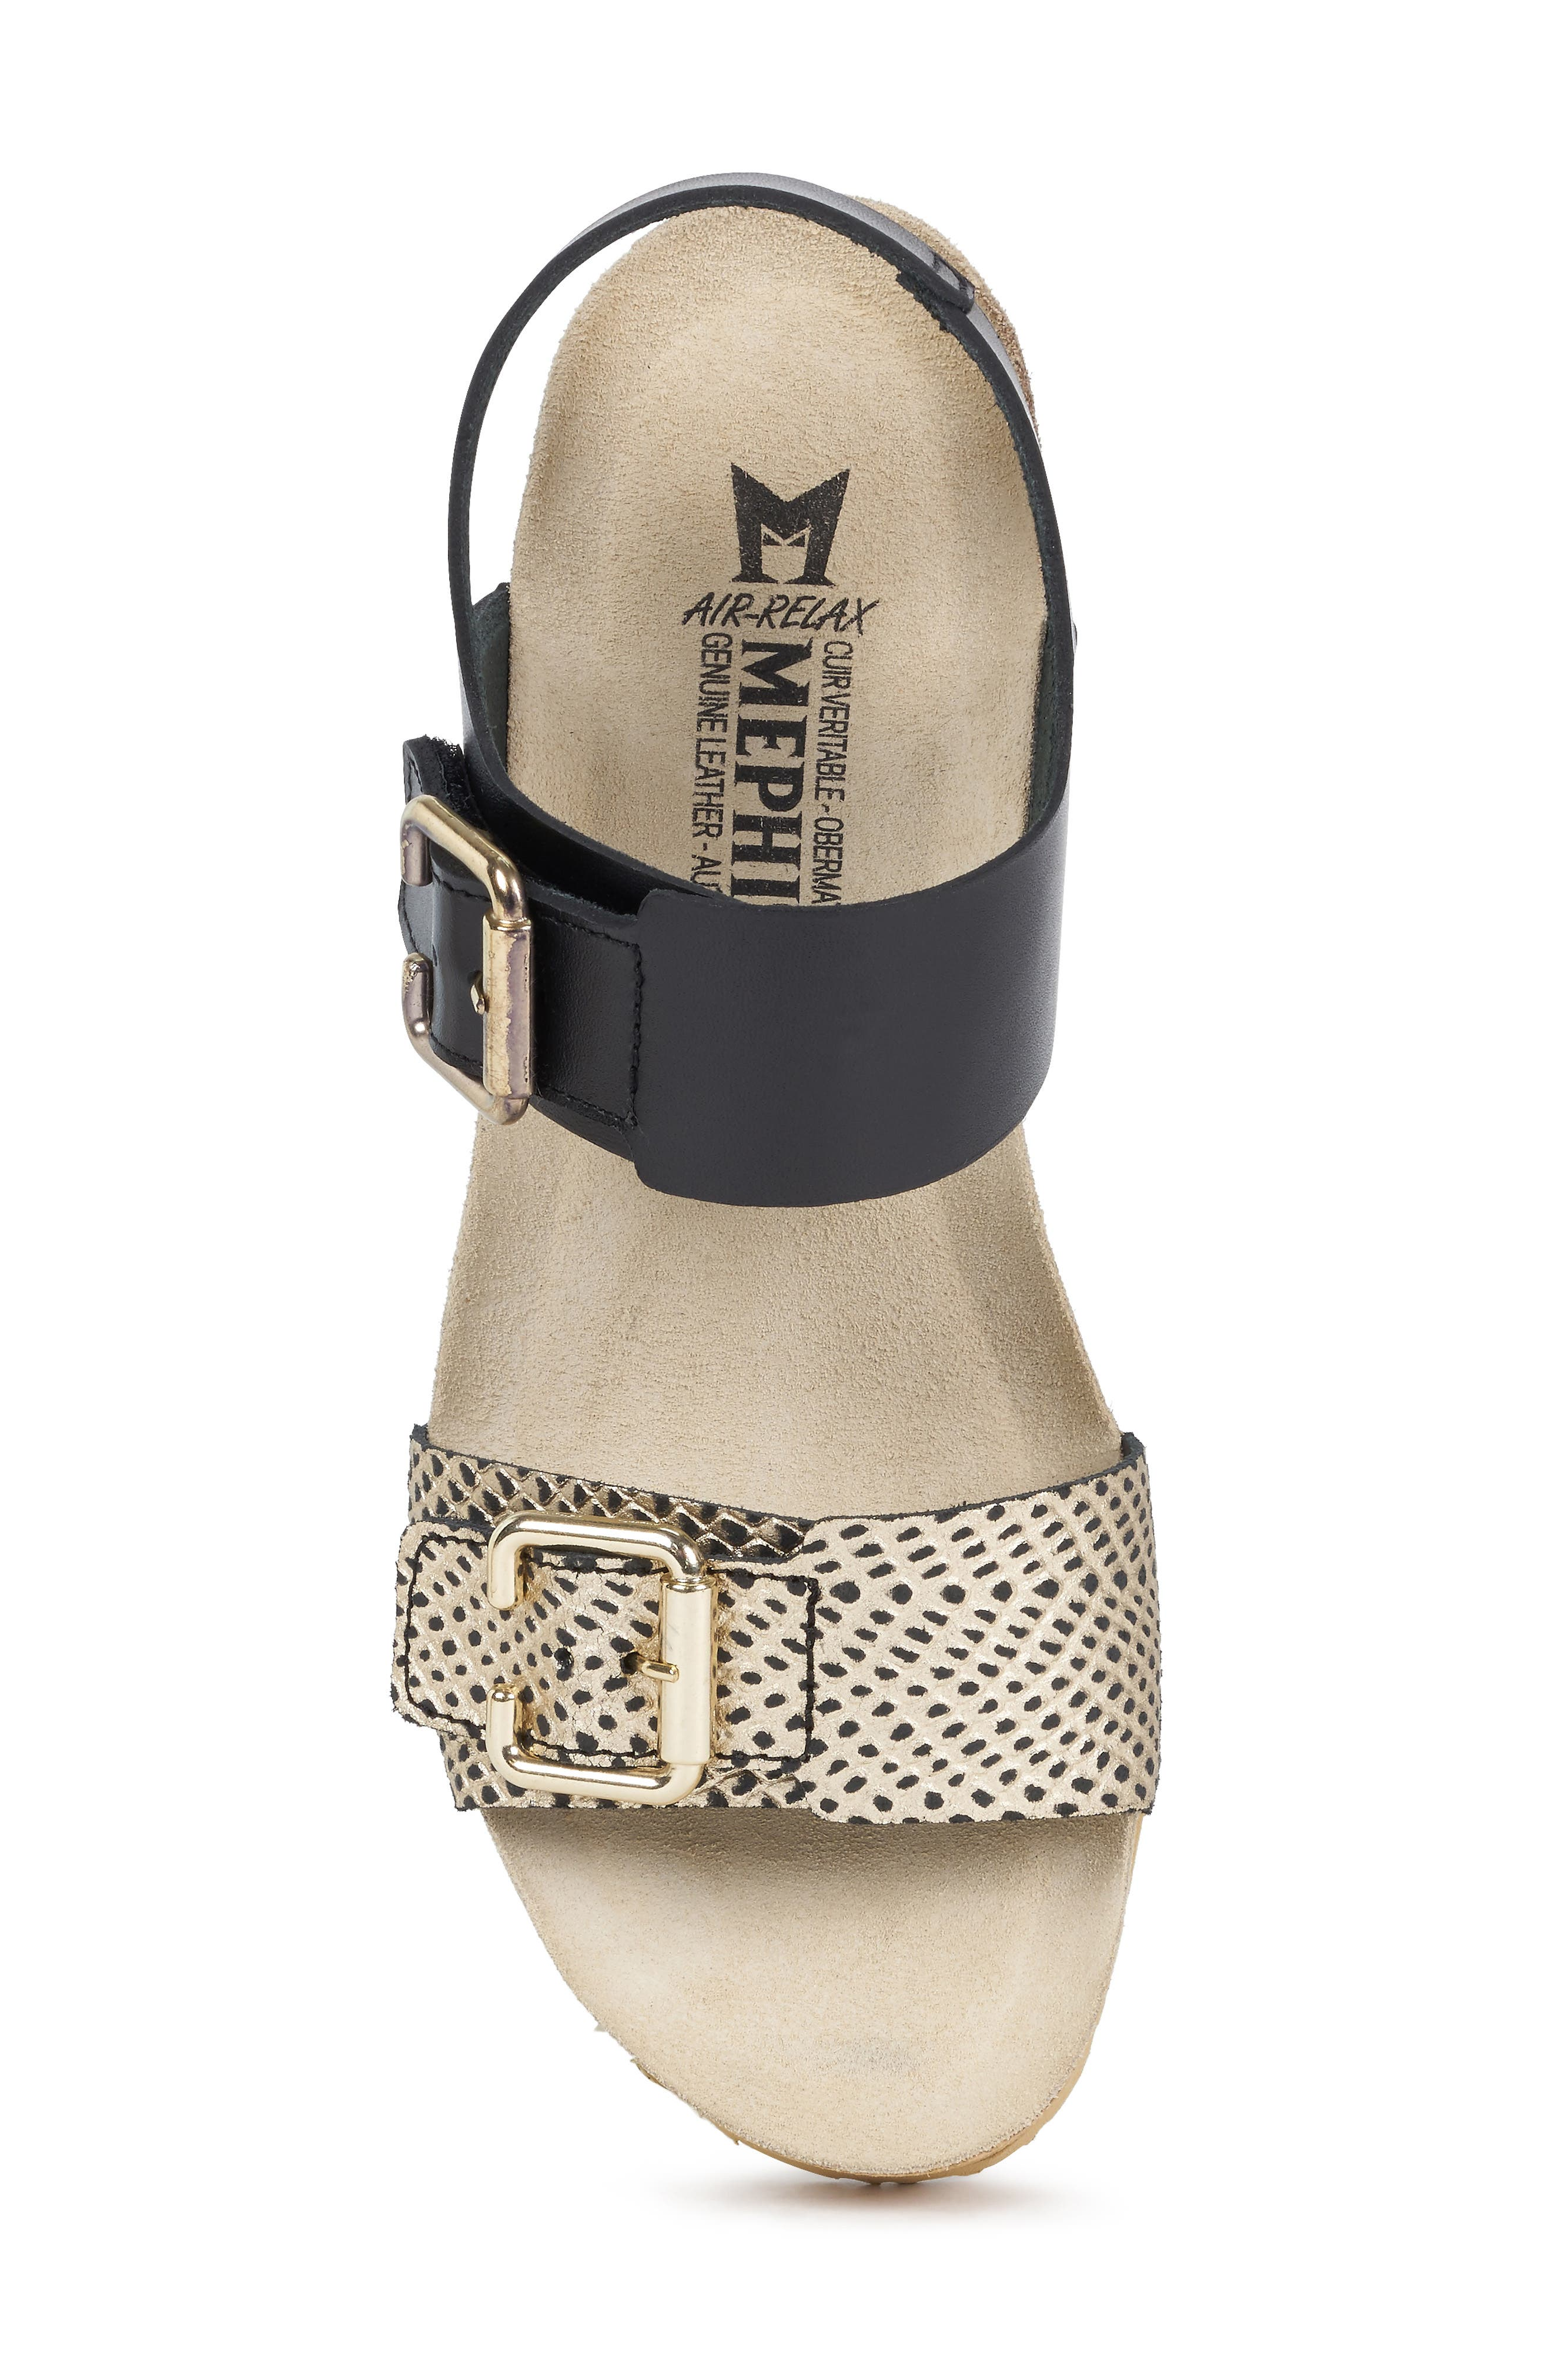 MEPHISTO, Lissandra Platform Wedge Sandal, Alternate thumbnail 5, color, BLACK/ GOLD LEATHER